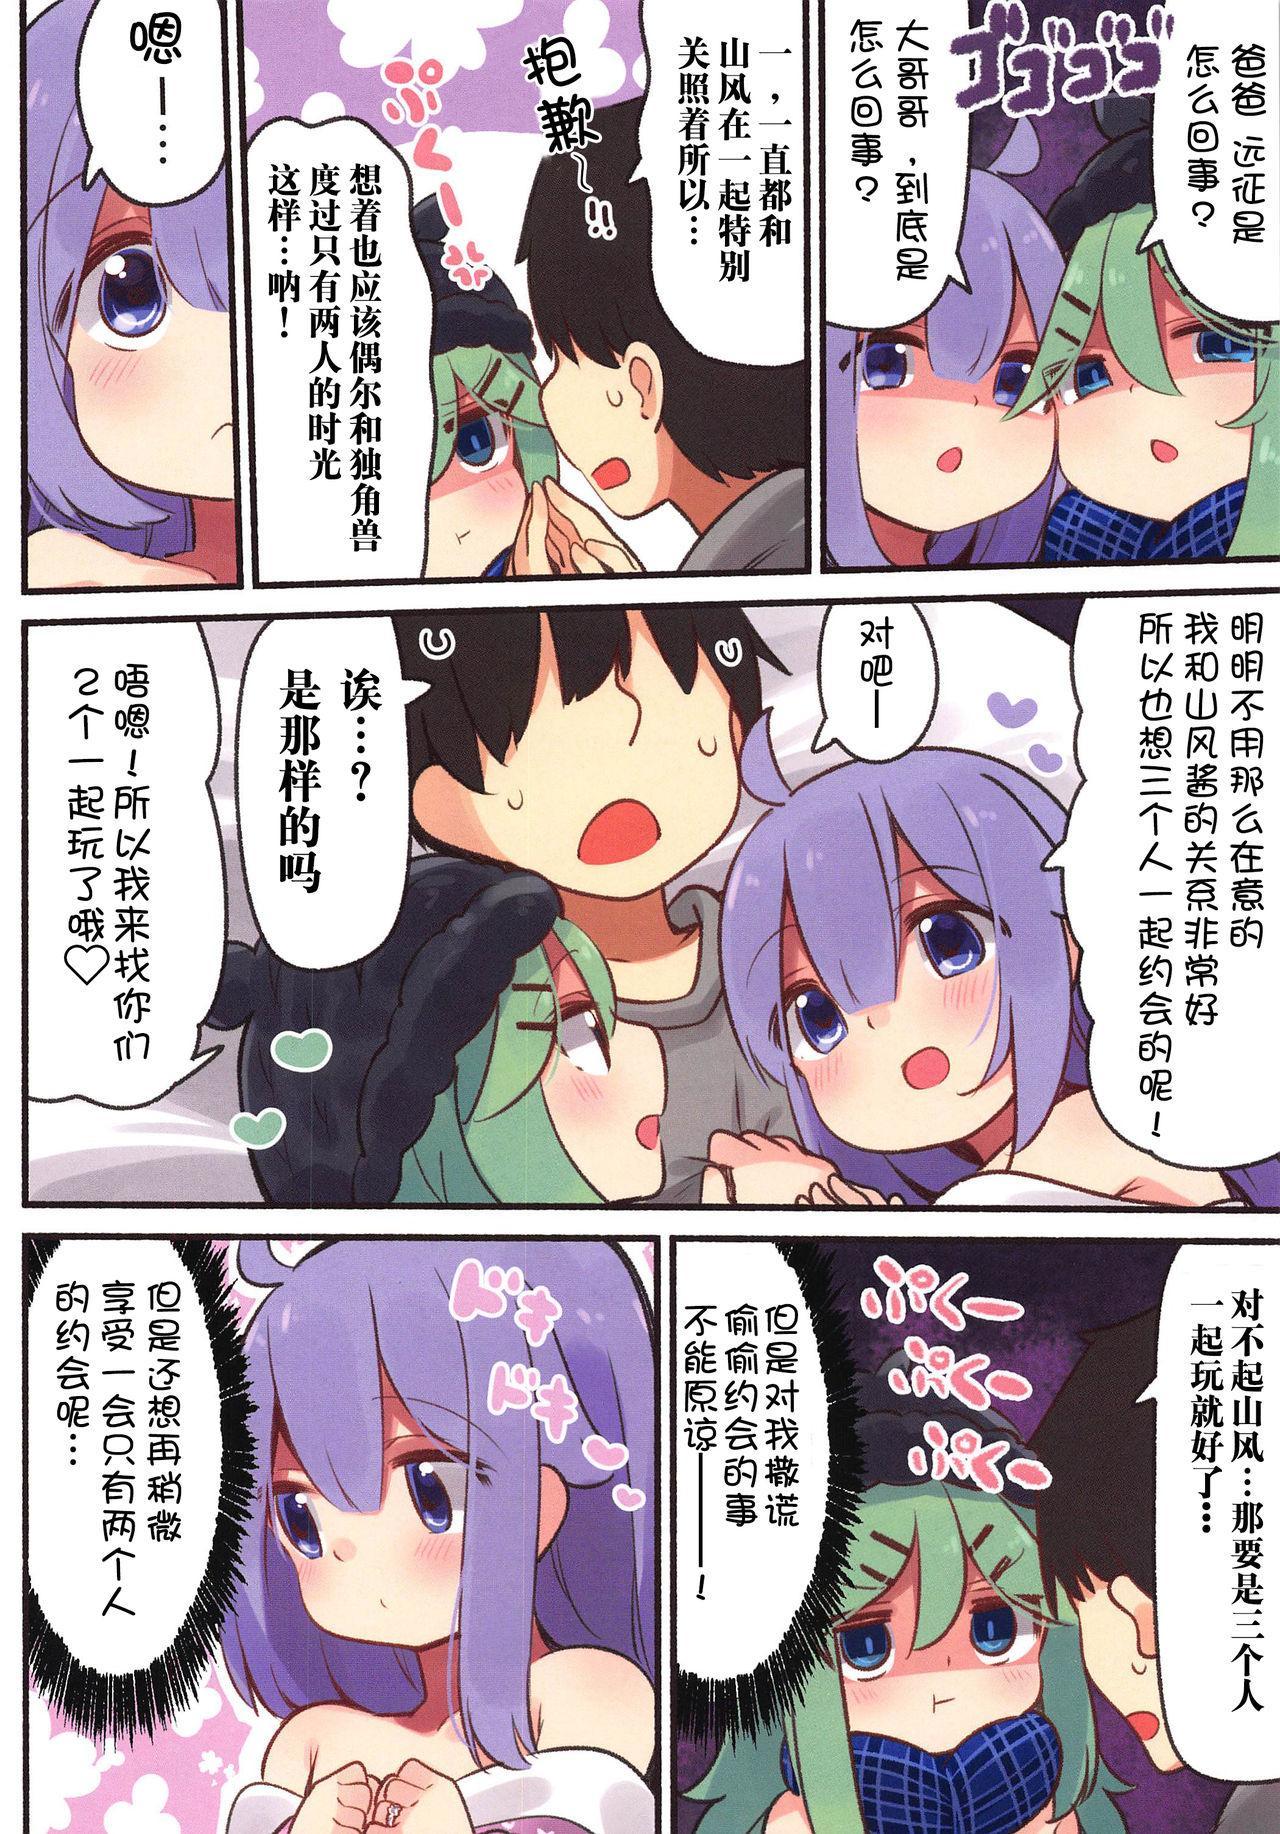 (COMIC1☆16) [Toto-taste (Suzuki Toto)] Papa wa (Onii-chan wa) Watasanai (Kantai Collection -KanColle-, Azur Lane) [Chinese] [钢华团汉化组] 6